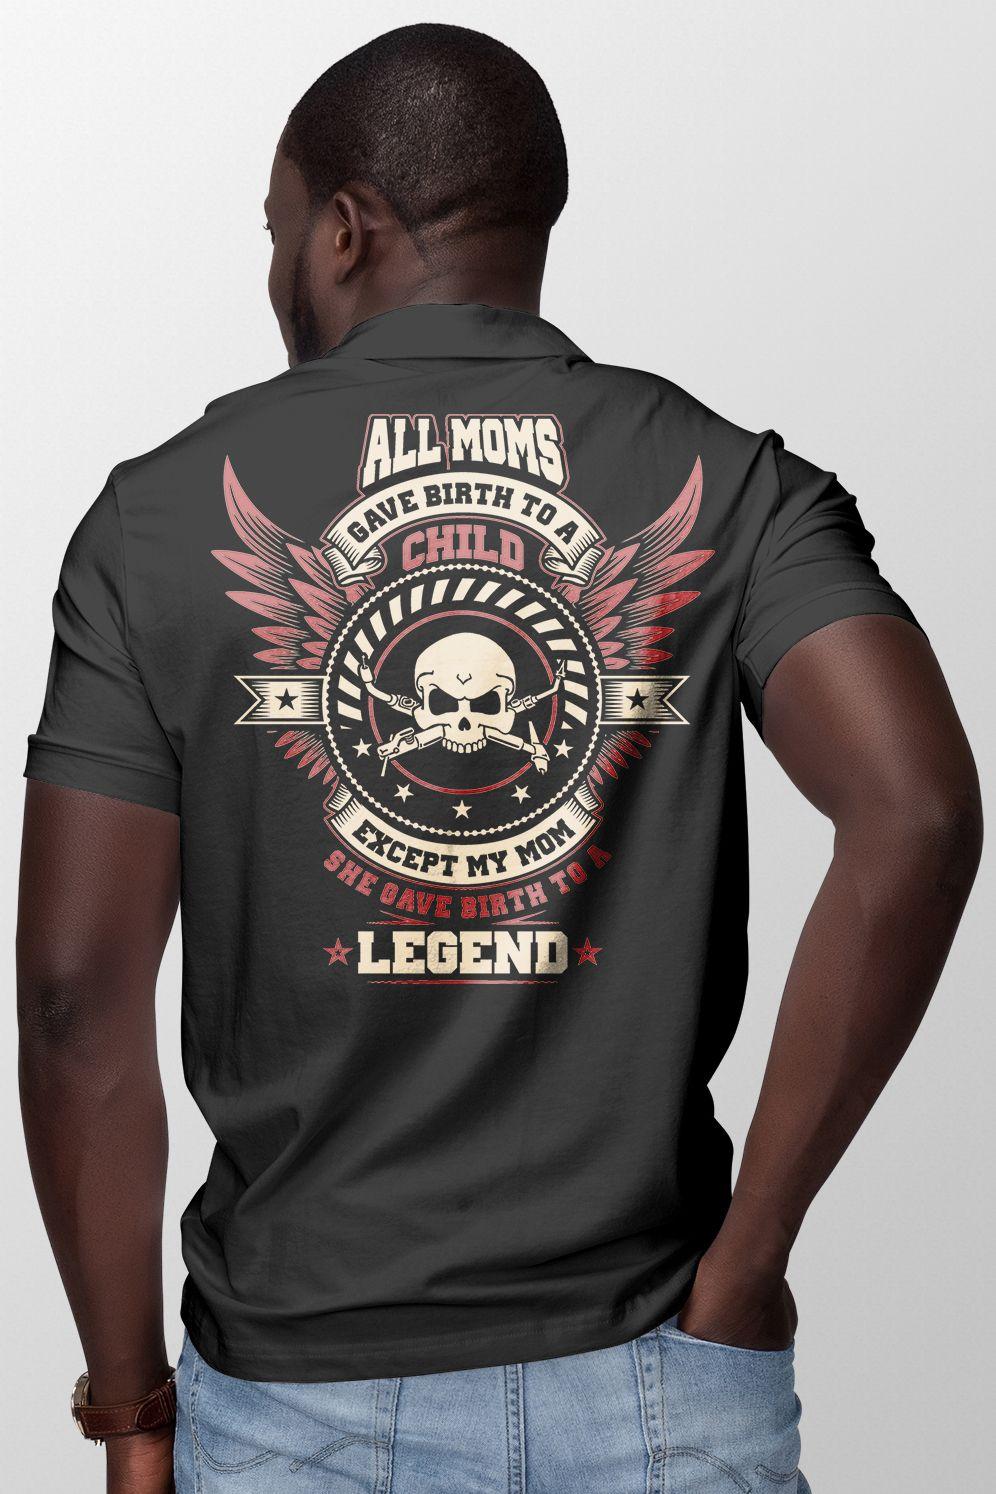 db3d041d Welder's Mom Gave Birth To A Legend - Welder Gift - Design available on Tee  Shirt Hoodie Tank Mug Sticker Long Sleeve ... #welder #welderlife #welding  ...